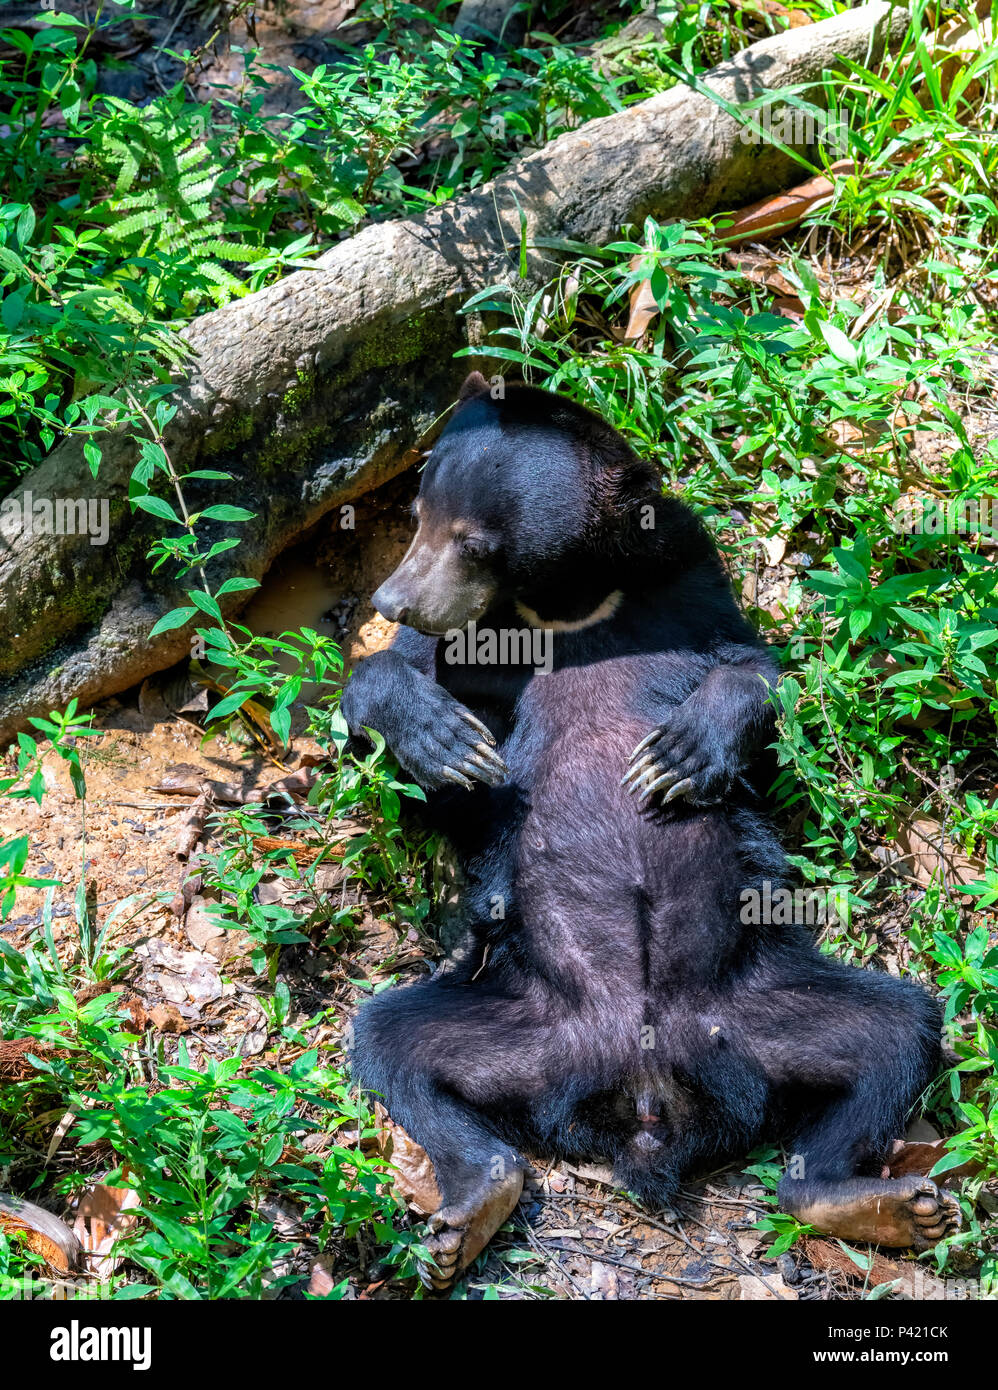 Sun Bear (Helarctos malayanus) lag auf dem Rücken im Regenwald am Bornesischen Sun Bear Conservation Centre in Sepilok, Sandakan, Borneo, Malaysia Stockfoto